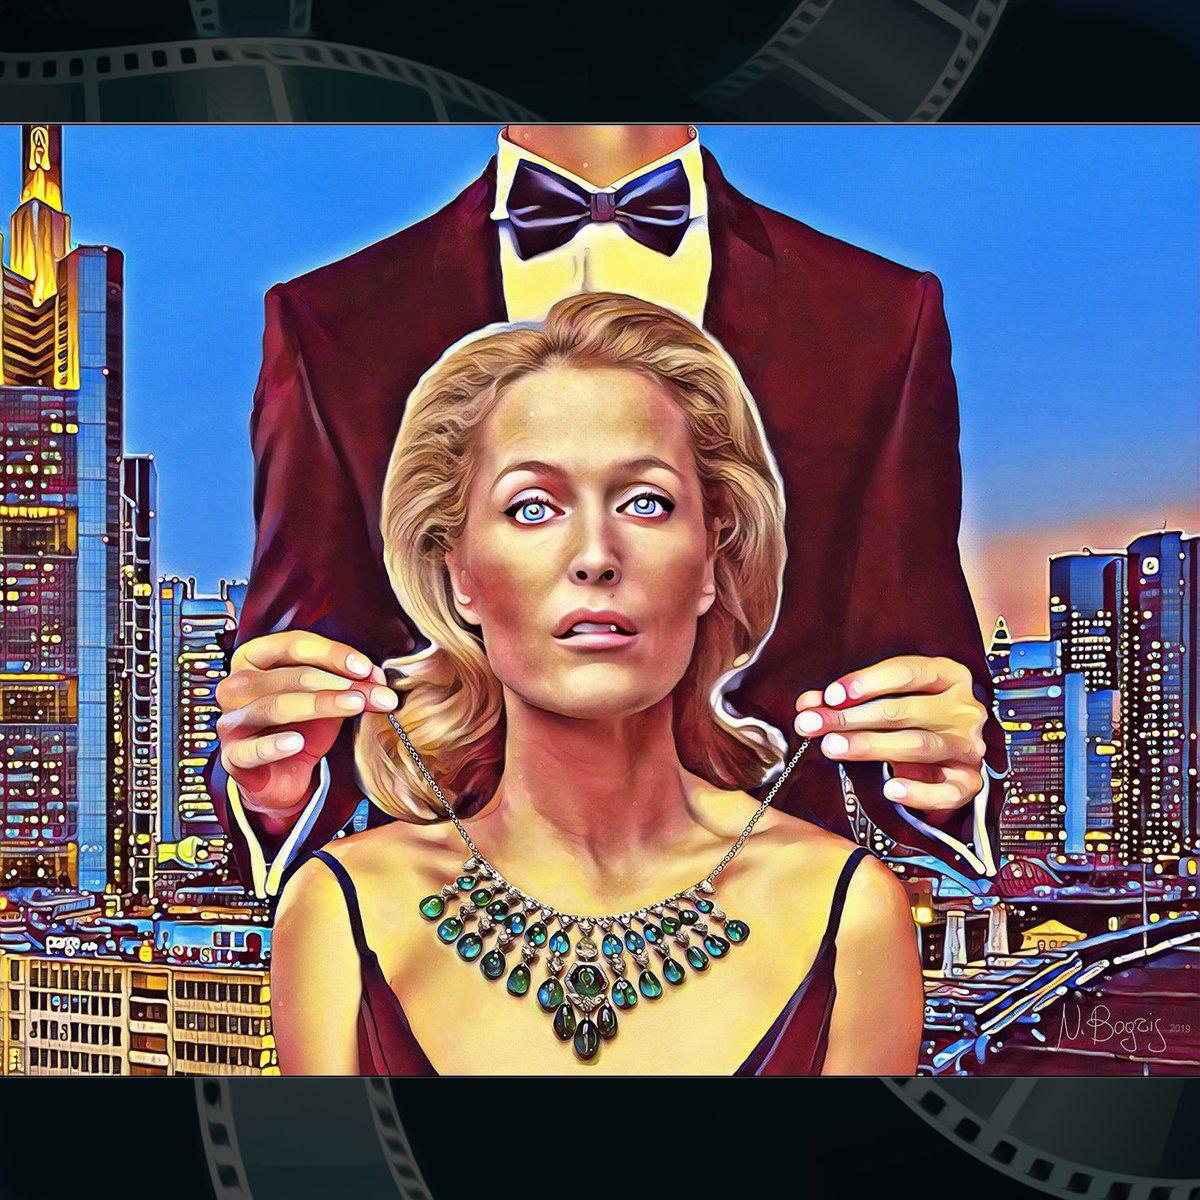 Gillian Anderson (2019)  Portrait, illustration of the wonderful actress. . #Portrait #Illustration #málverk #Lapeinture #ペインティング #maalaus #pittura #tv #gilliananderson   #illustrator #actress #fan #poster #art #artist #Painting #print #Xfiles #그림 #絵 #cinema #portrait